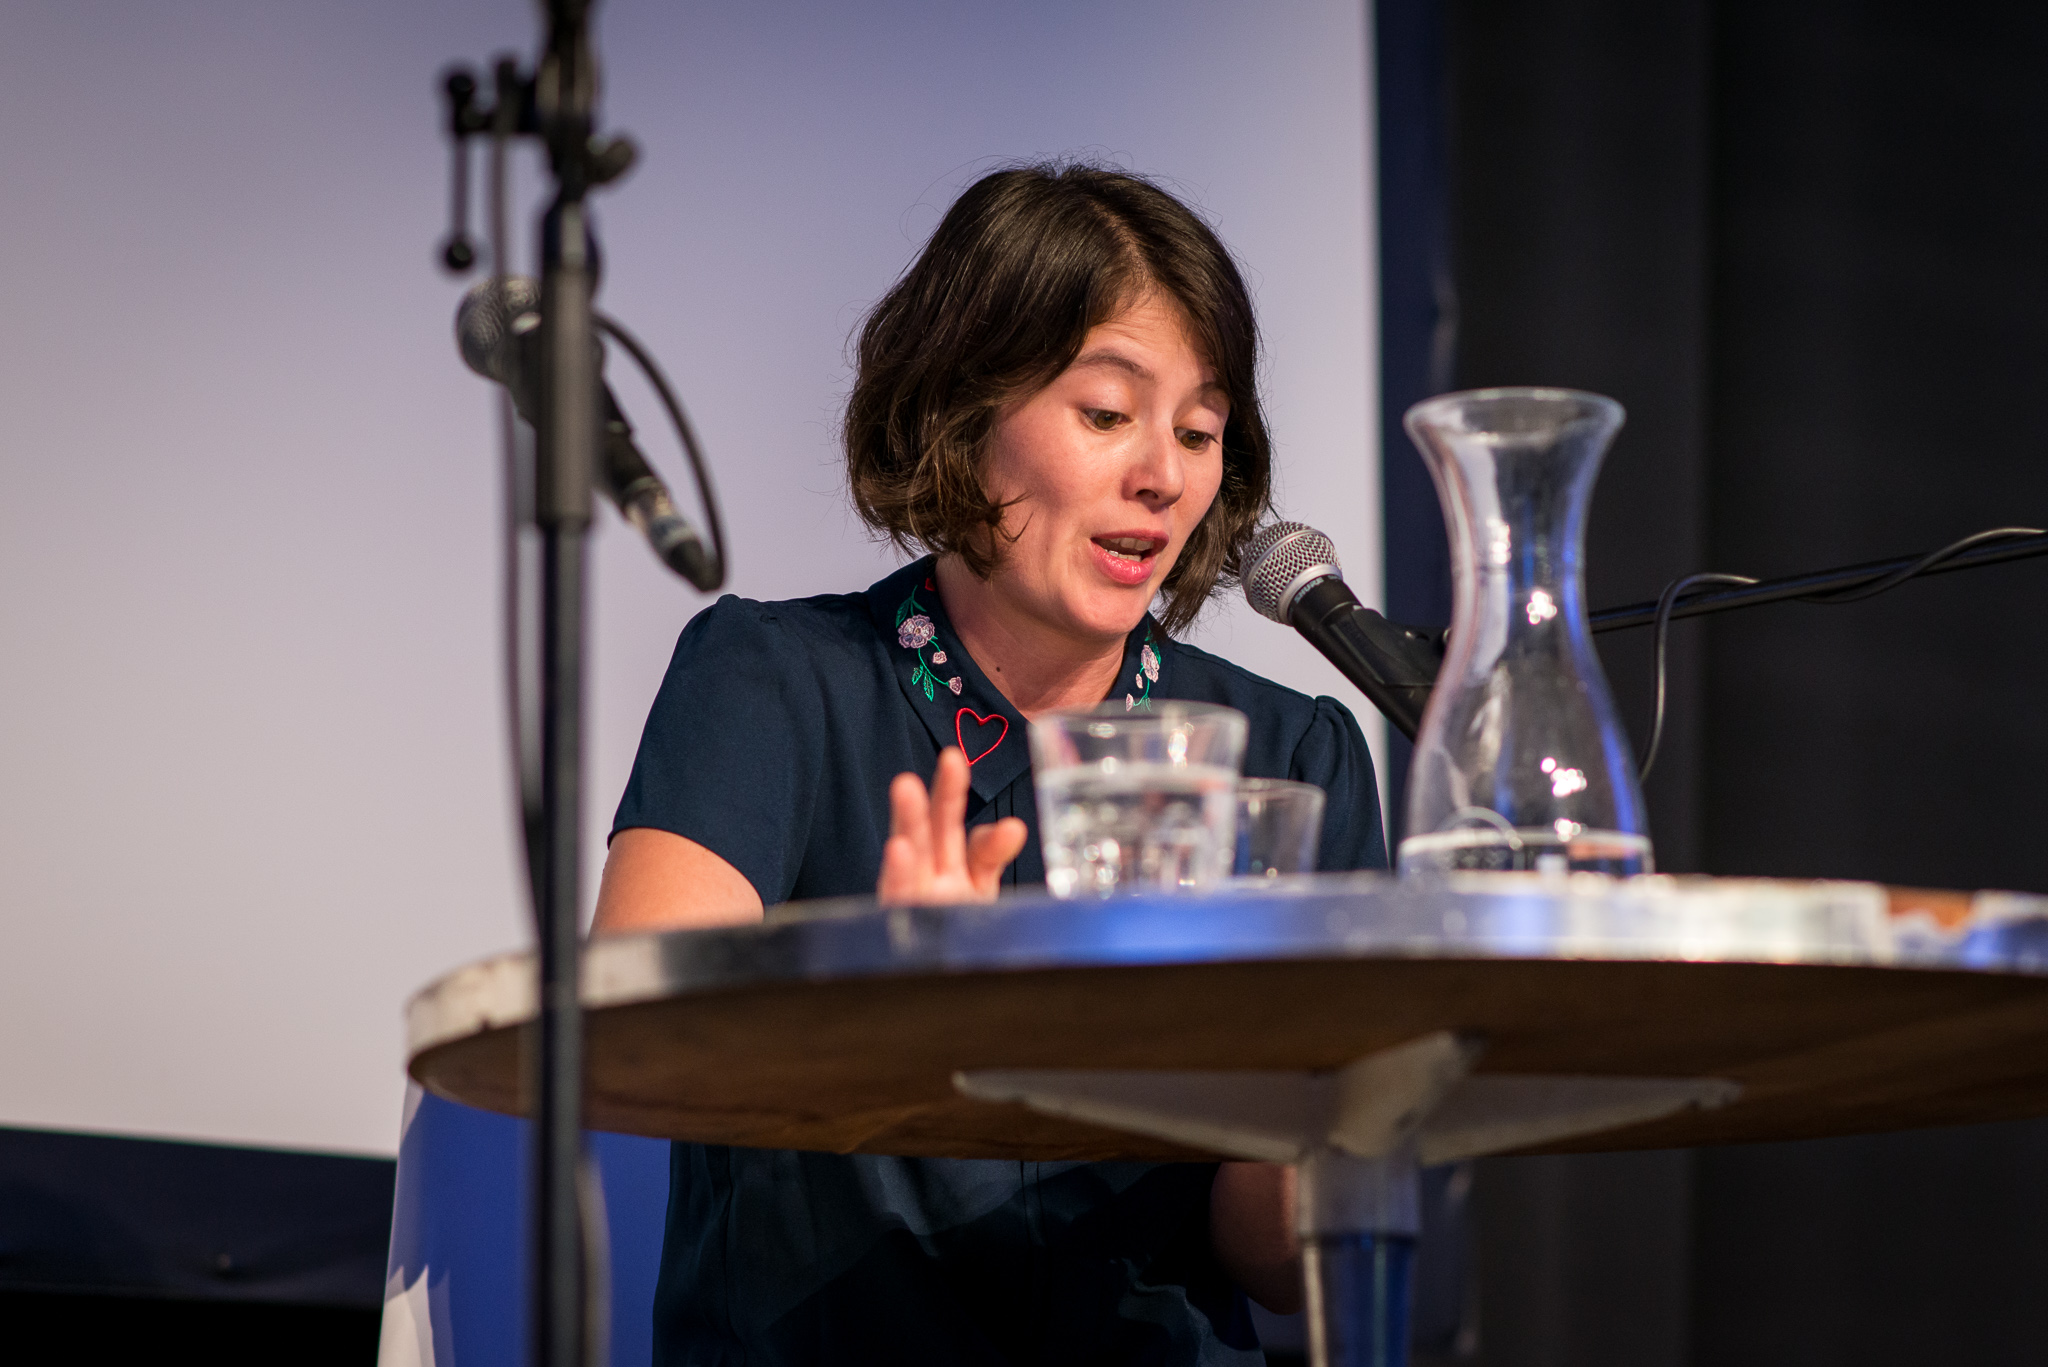 O-TÖNE 2018 mit Milena Michiko Flasar